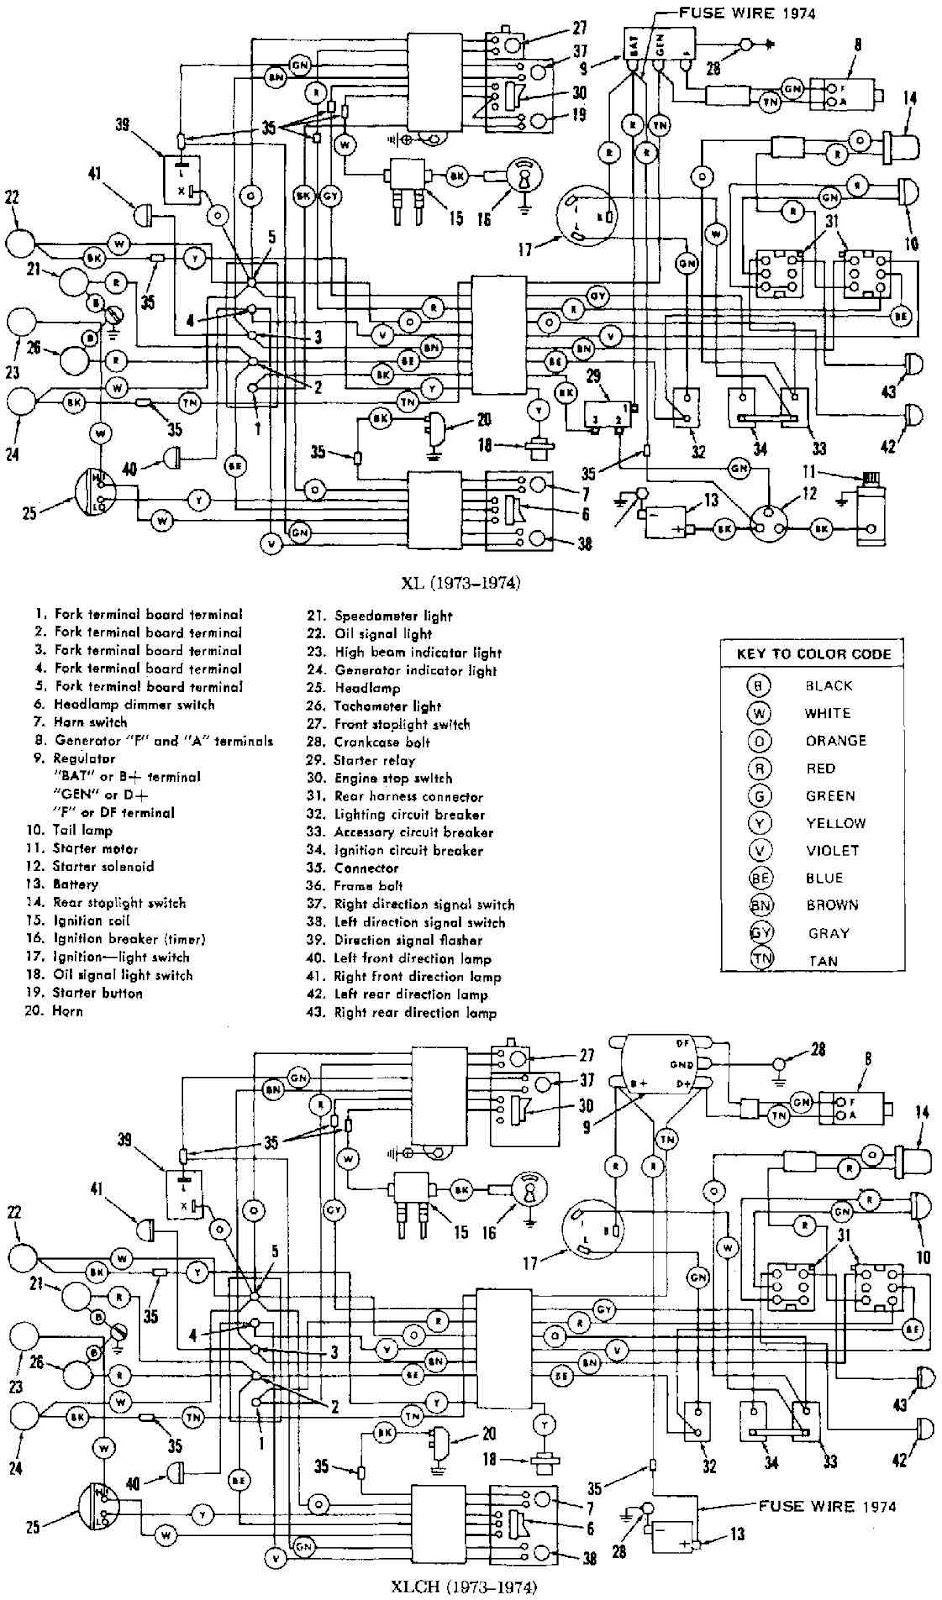 2009 harley flh wiring diagram wiring library 1964 flh wiring diagram [ 942 x 1600 Pixel ]